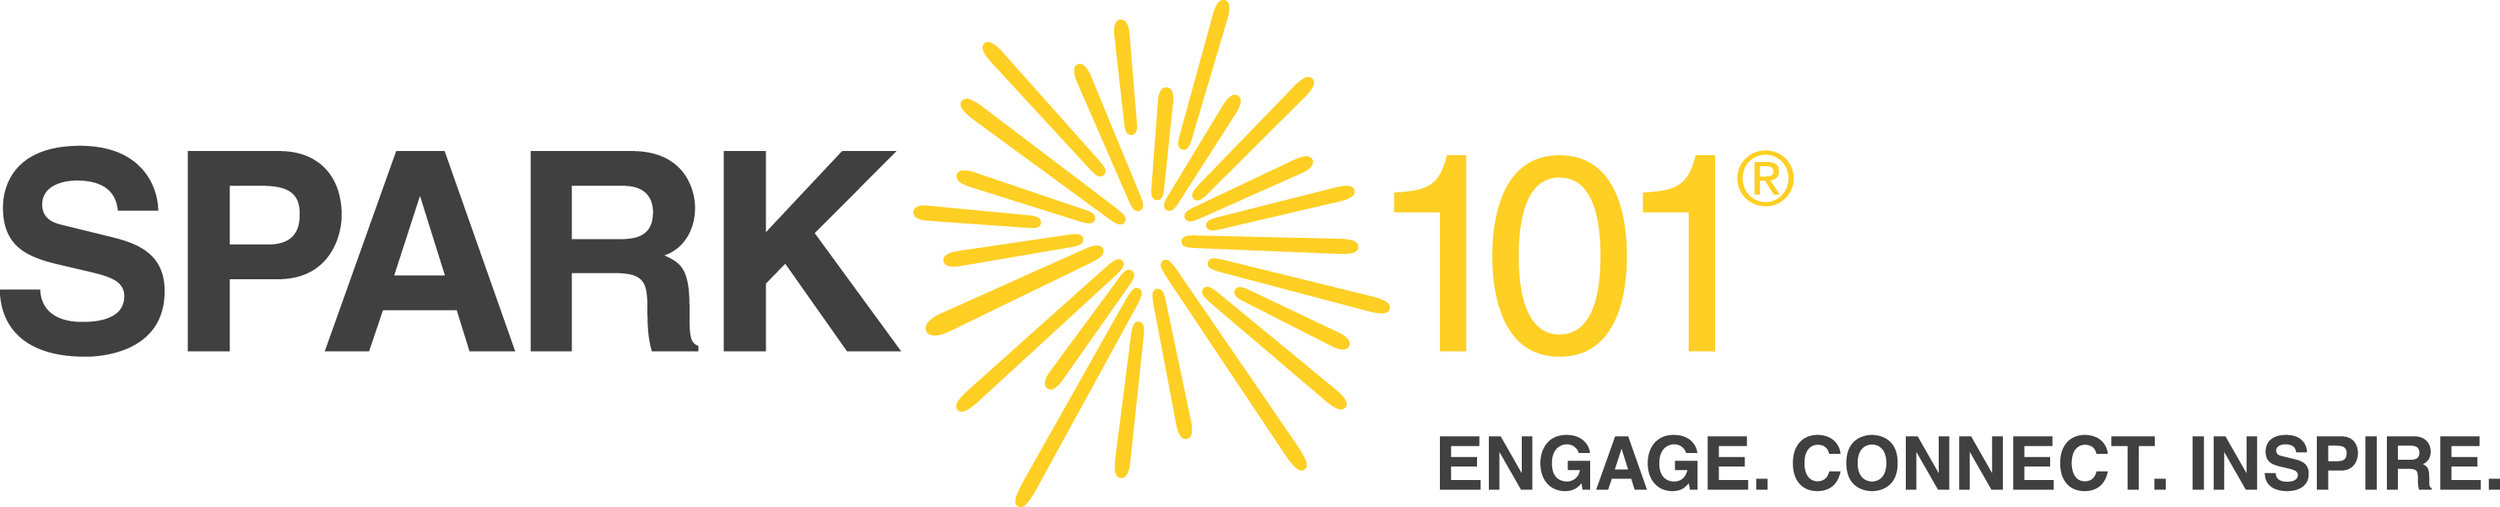 Spark 101 Logo_cmyk.jpg